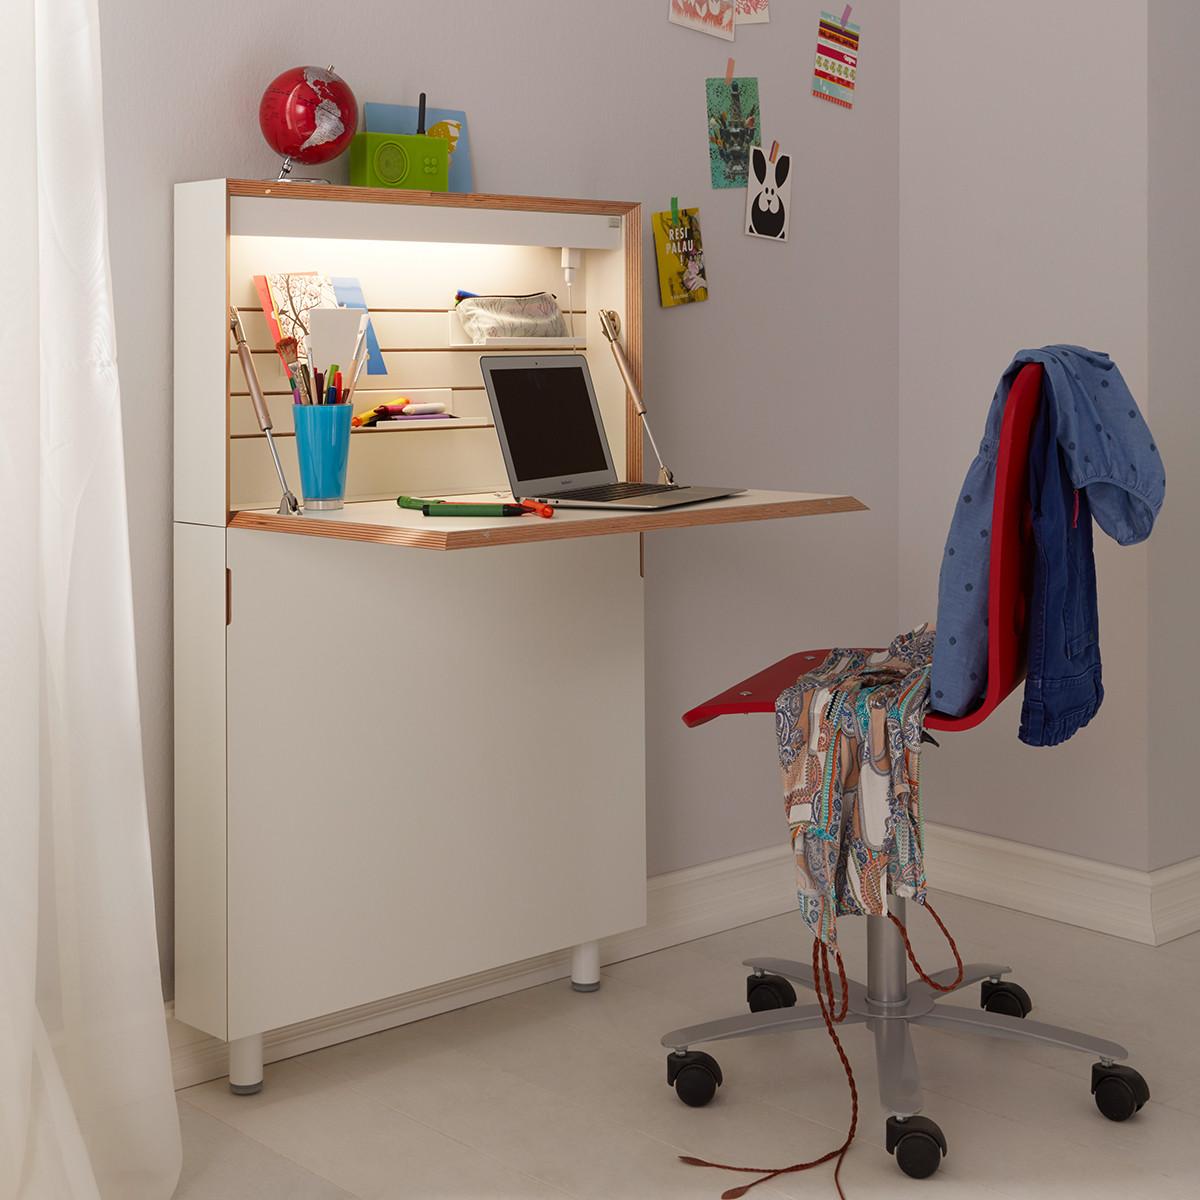 m ller m belwerkst tten flatmate sekret r in wei casa de. Black Bedroom Furniture Sets. Home Design Ideas